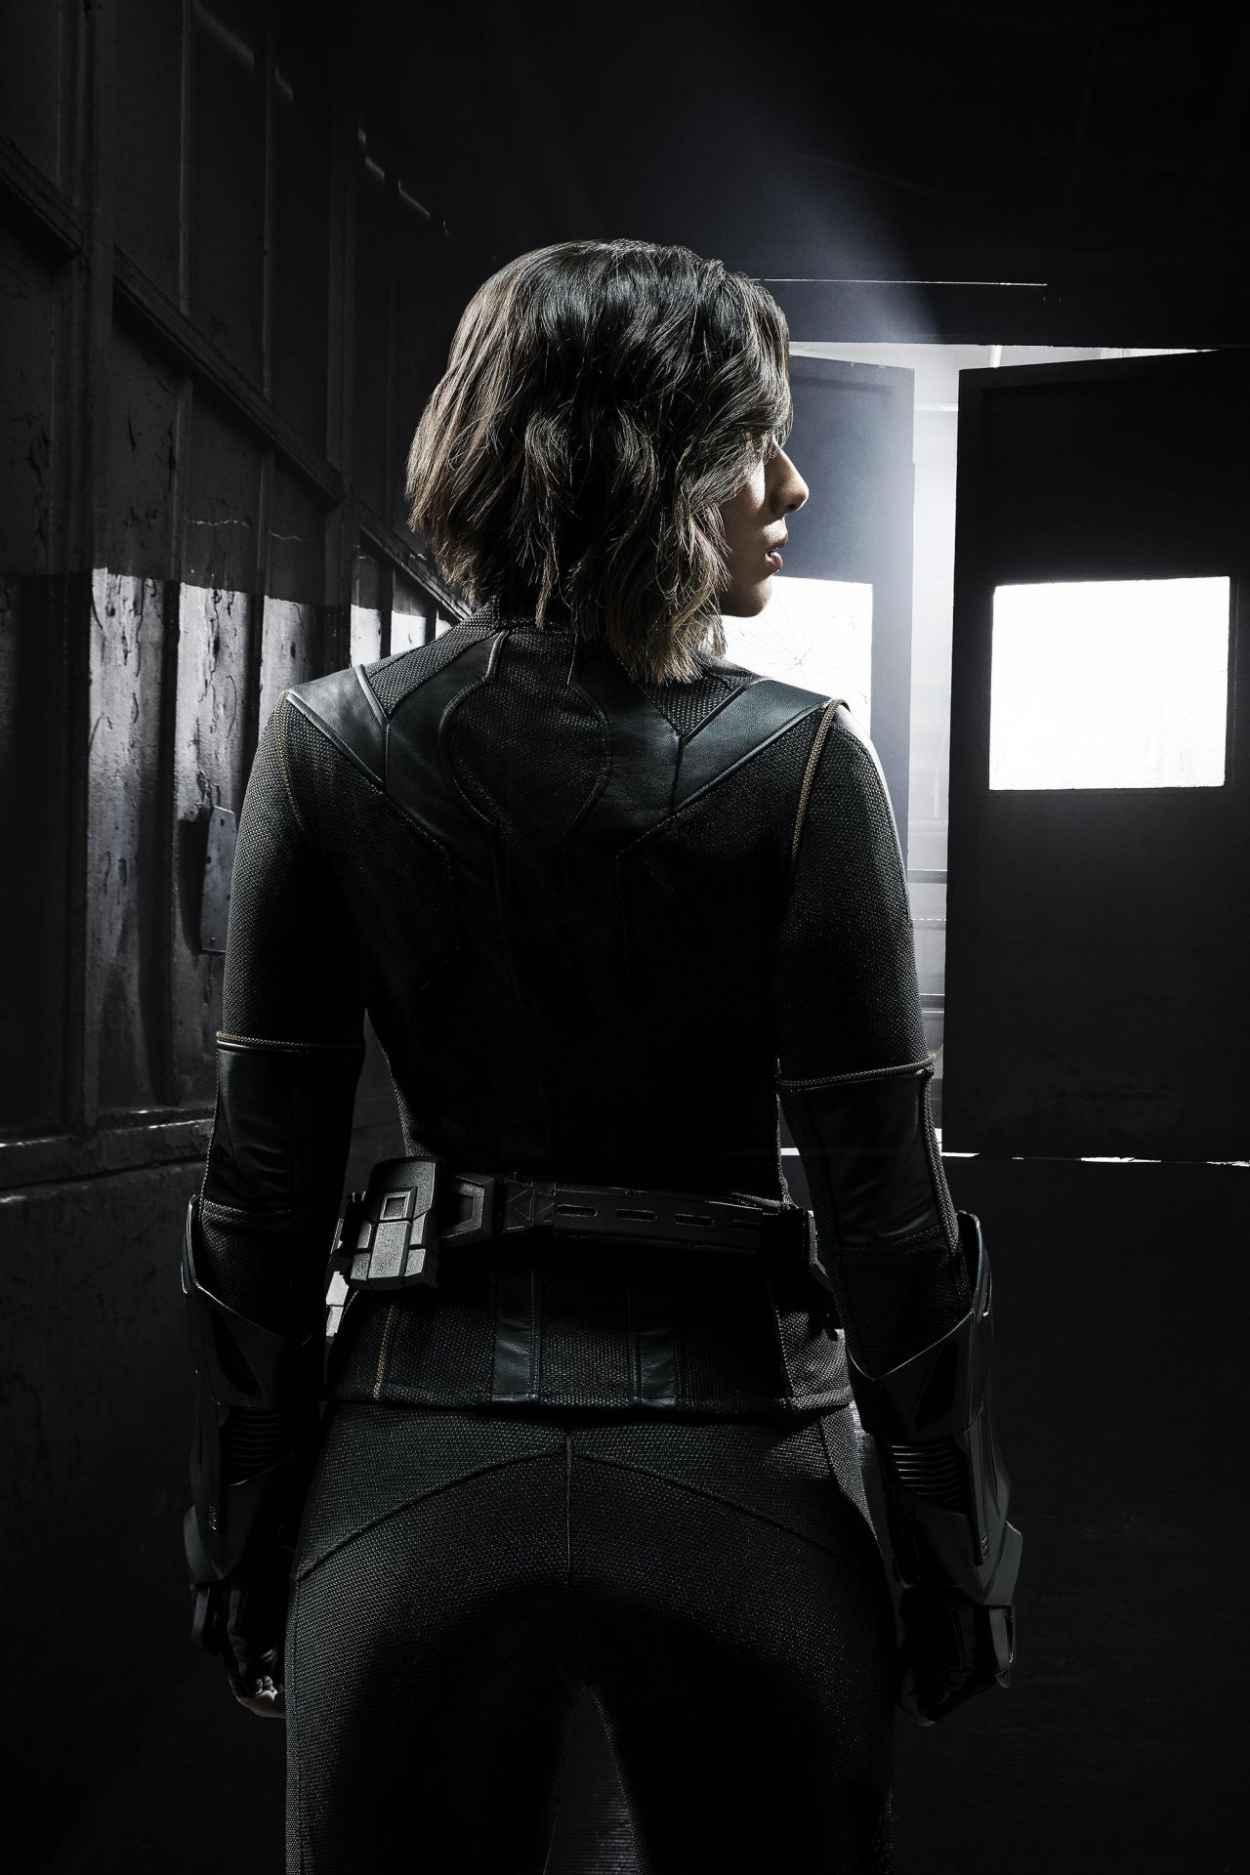 Chloe Bennet - Agents of SHIELD Season 3 Photos-2